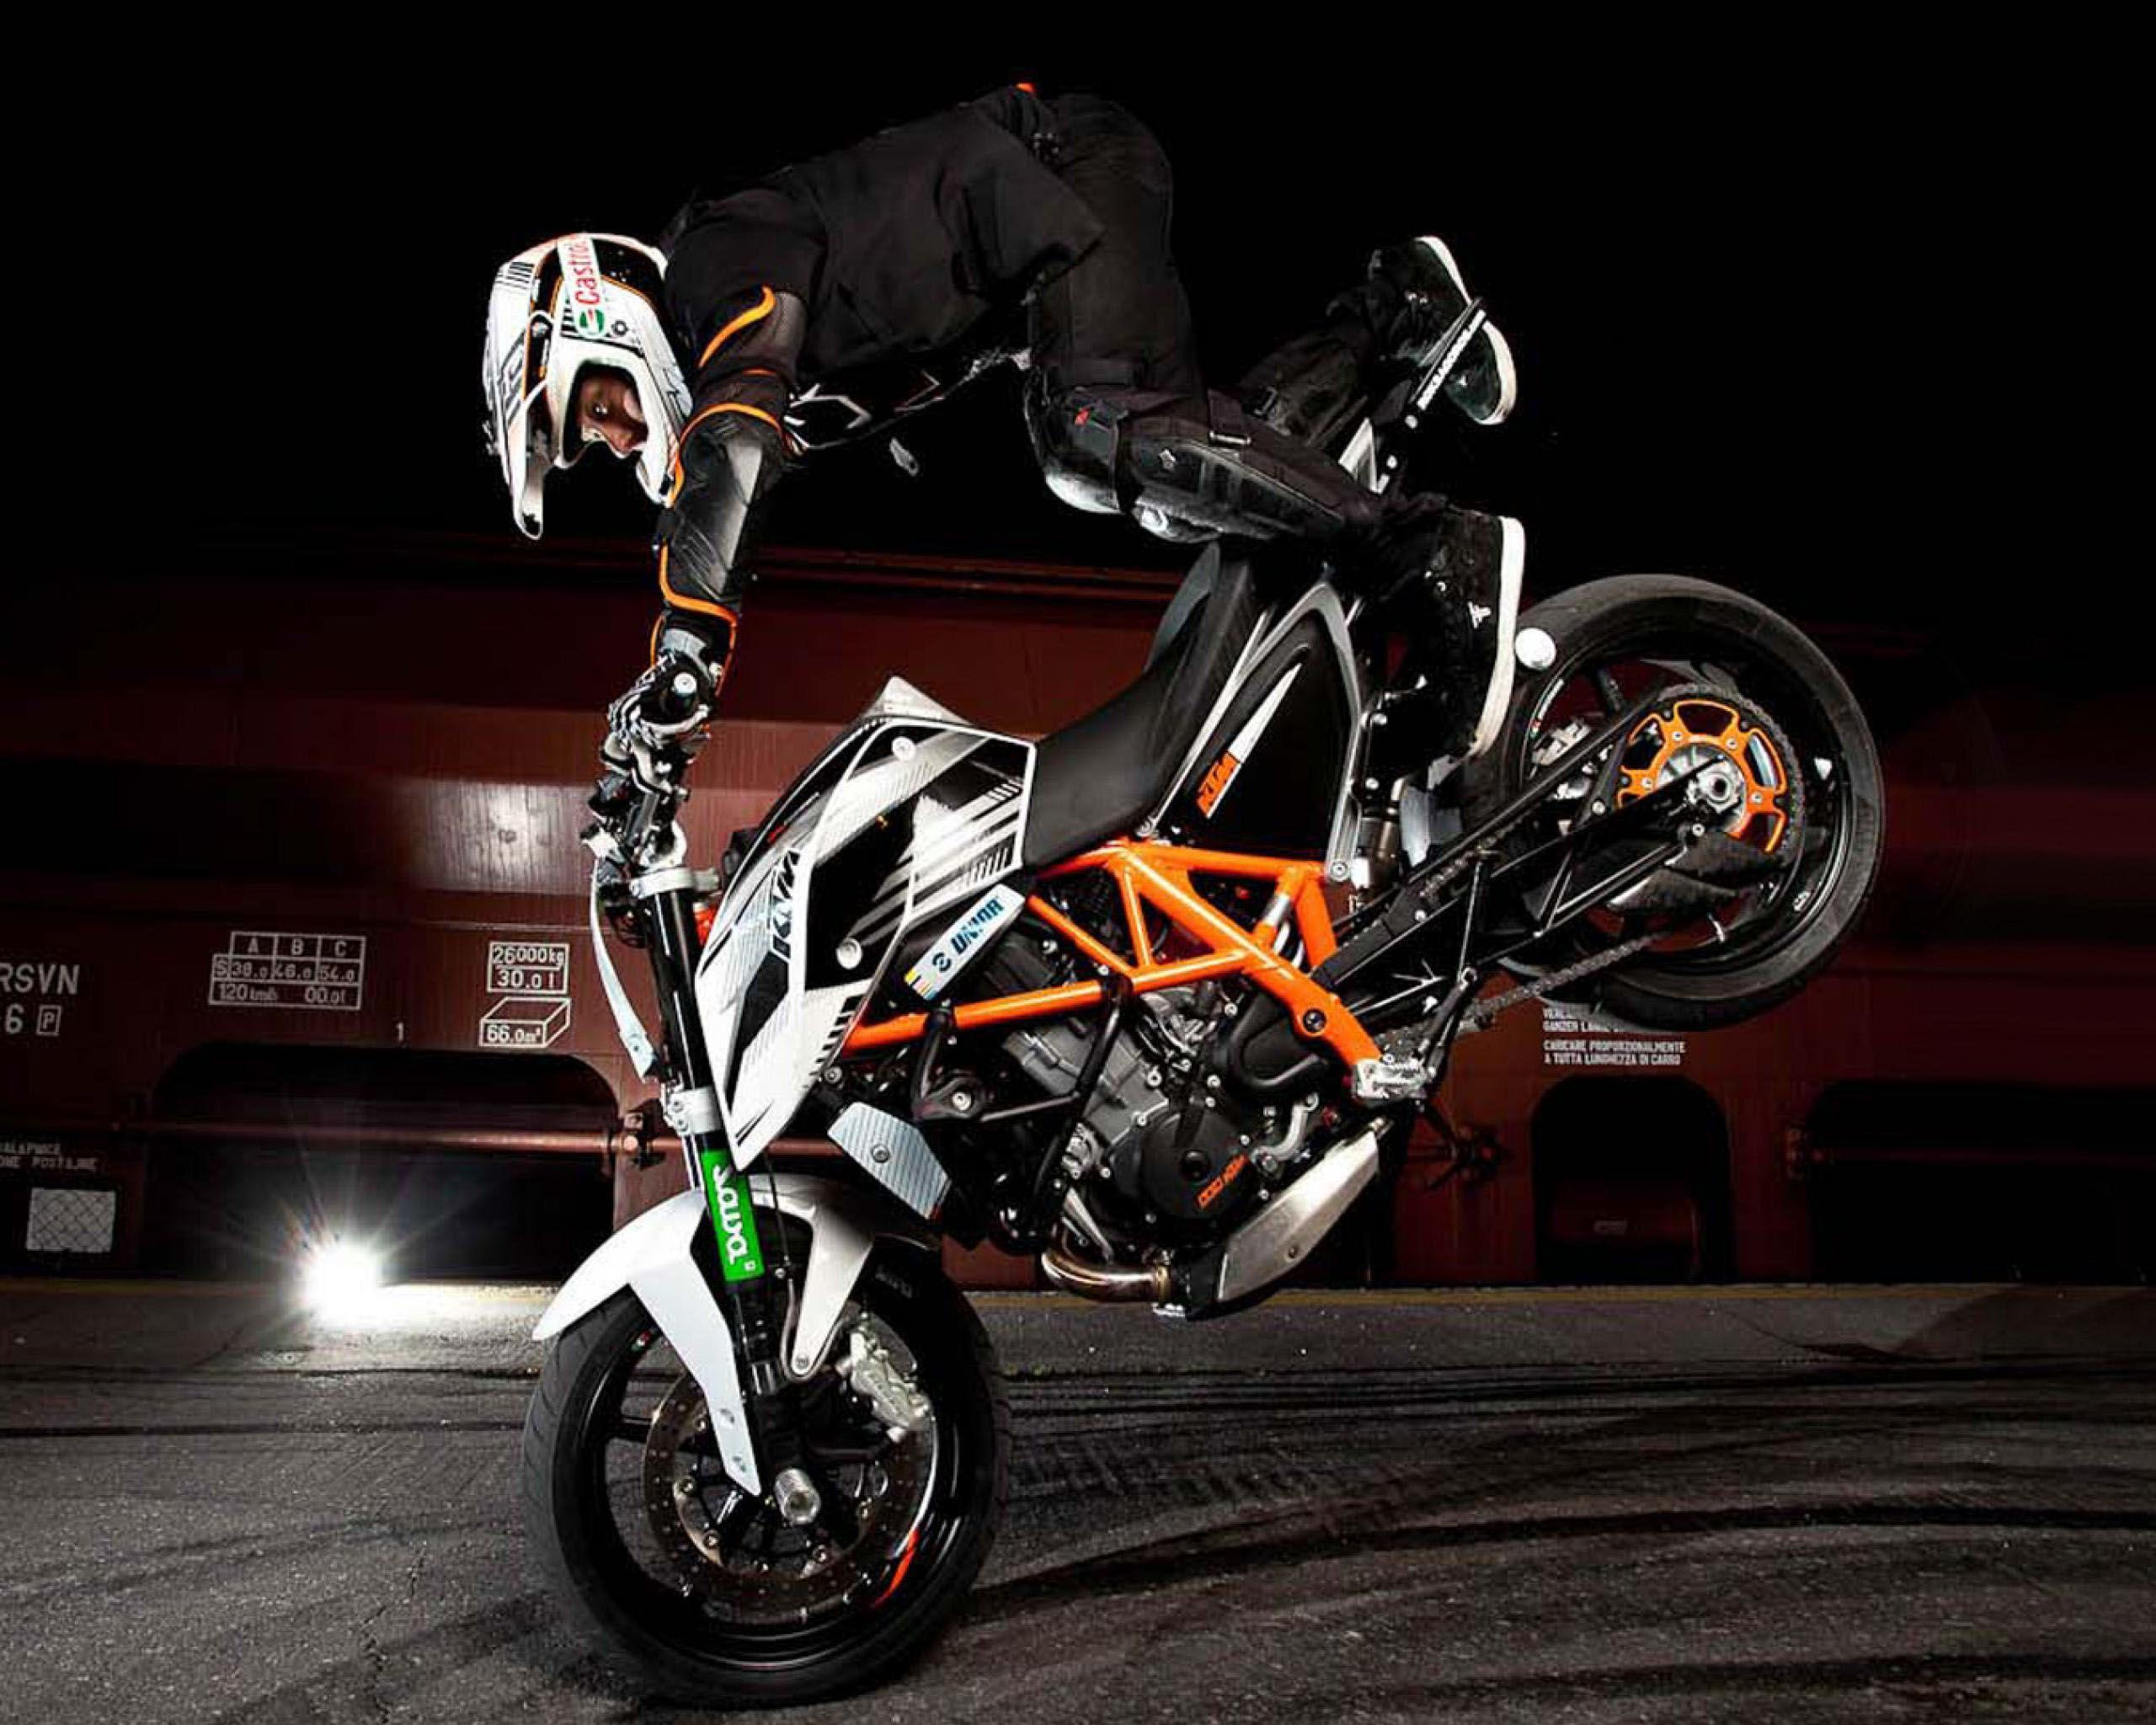 dangerous bike stunt in 2017 hd wallpapers - wallpaper cave